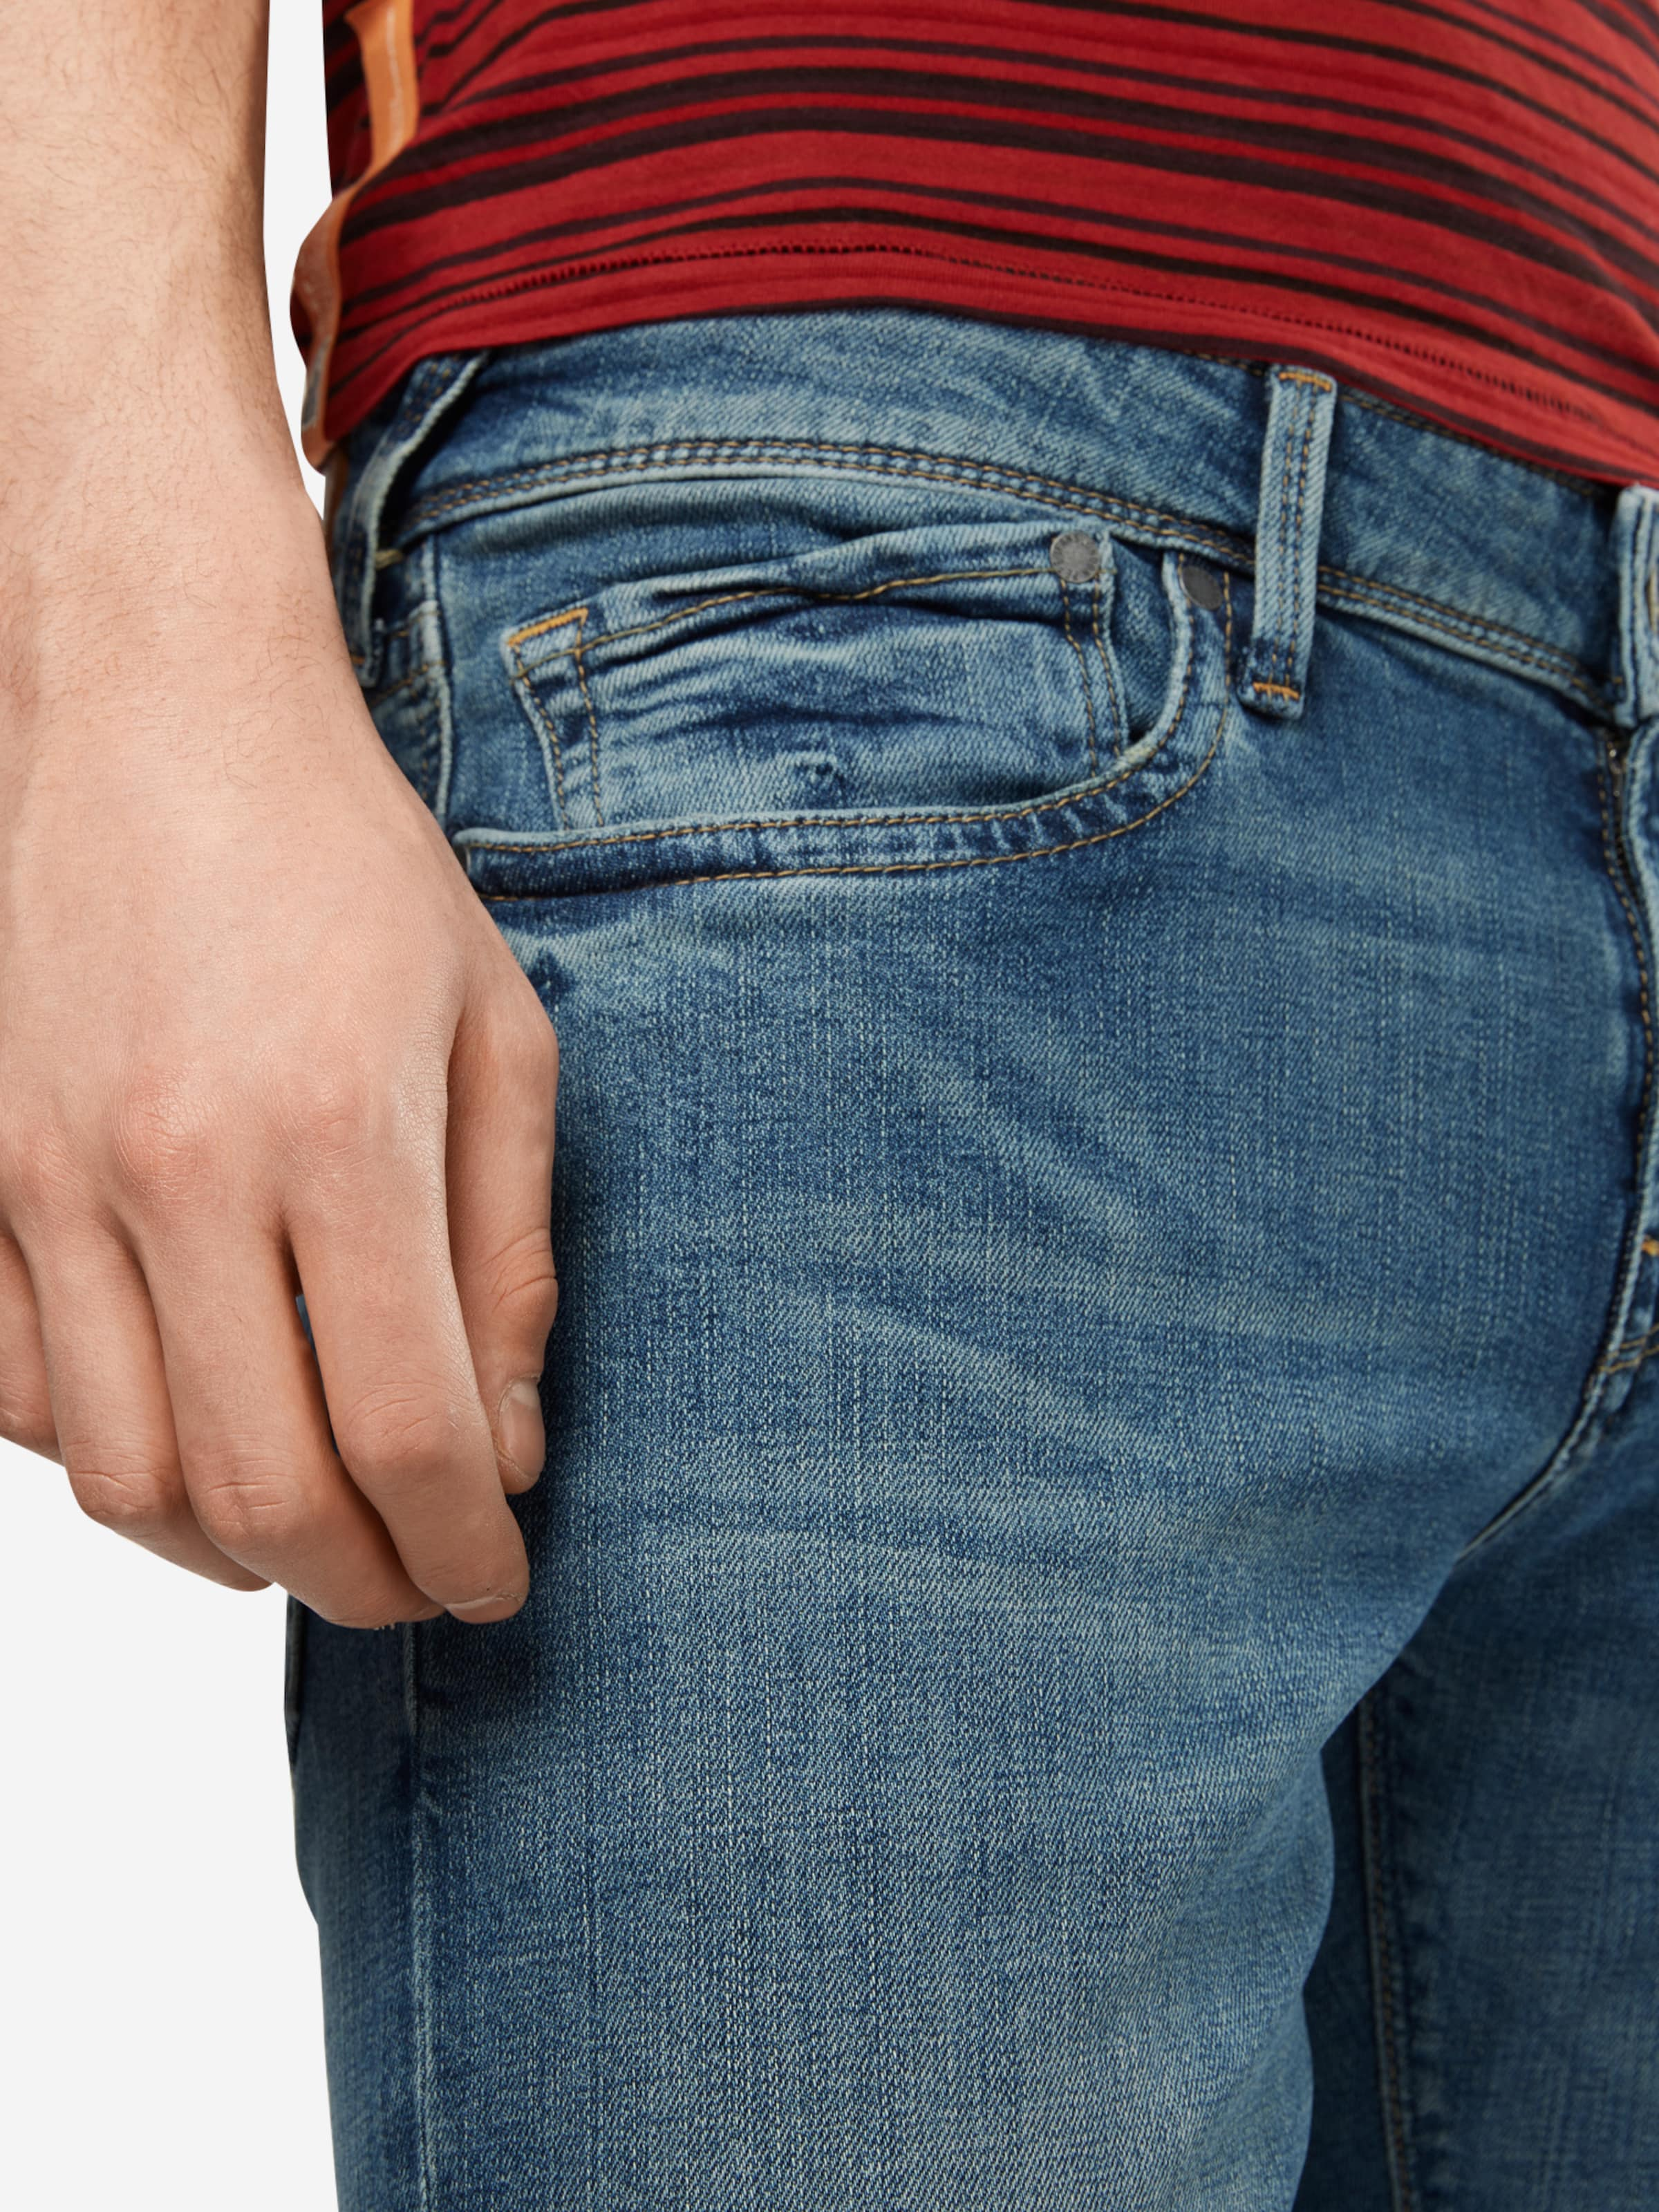 Pepe Jeans Jeans in Used-Optik 'Hatch' Freies Verschiffen Versorgung 6vgC2